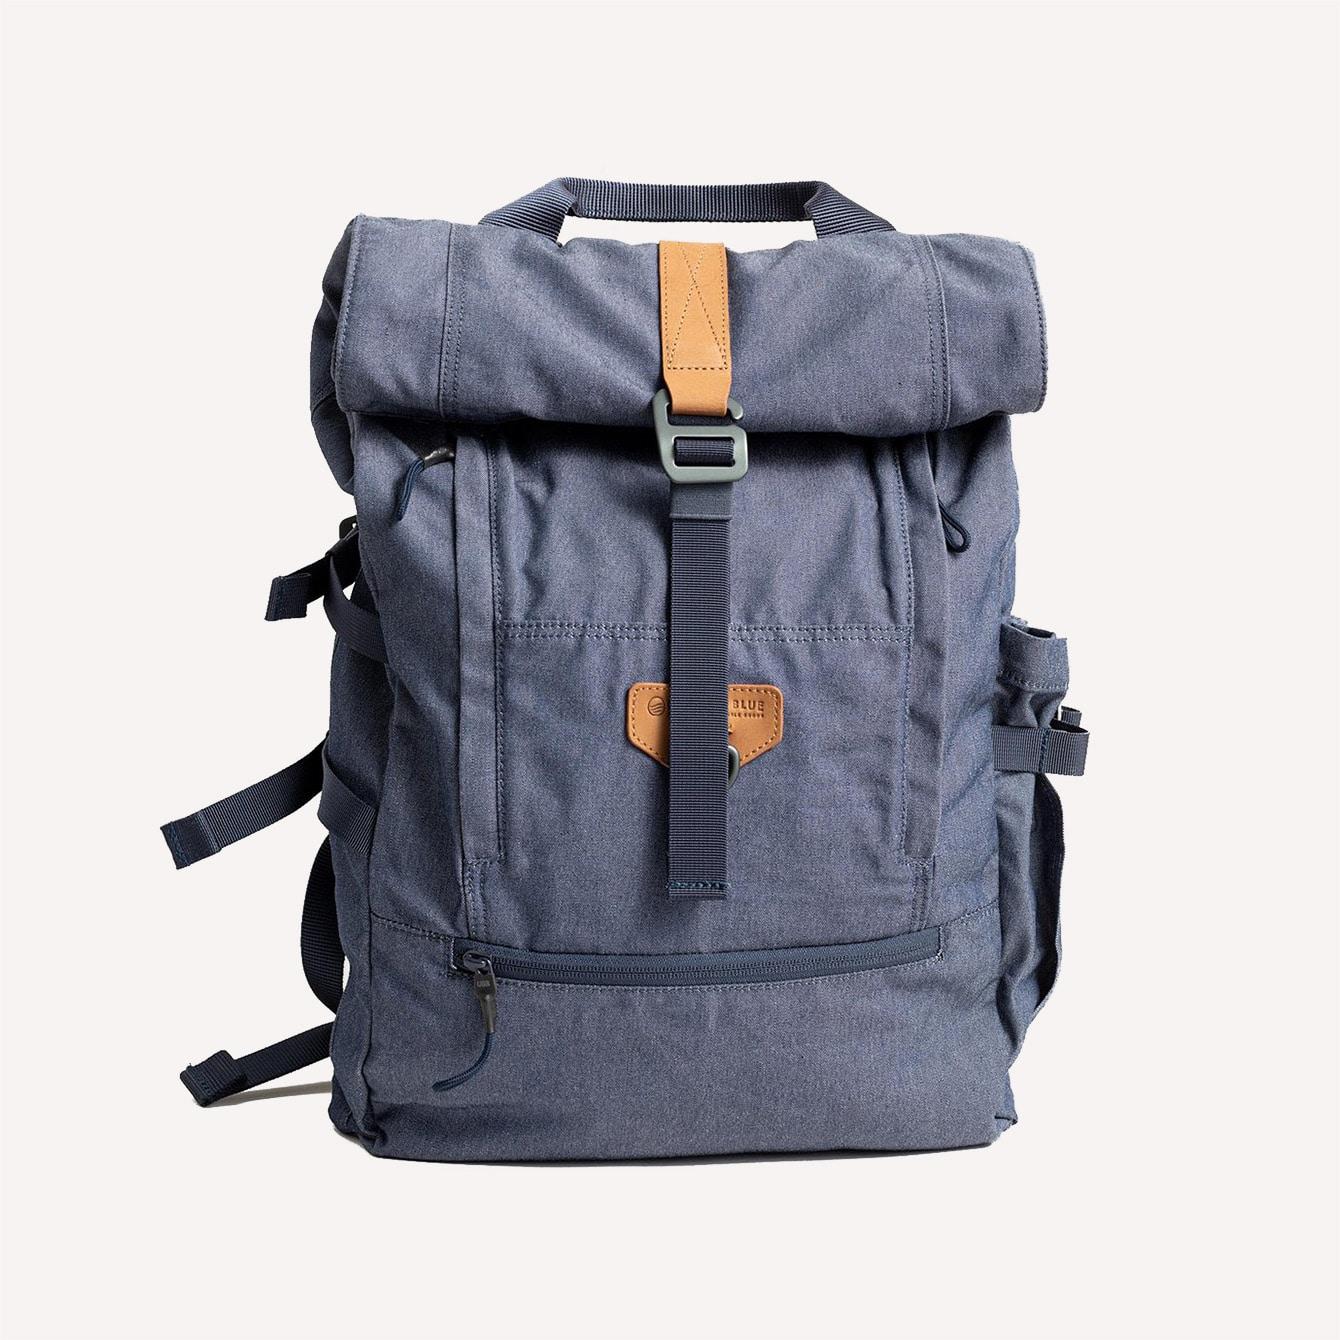 Westward 23L Rolltop Backpack